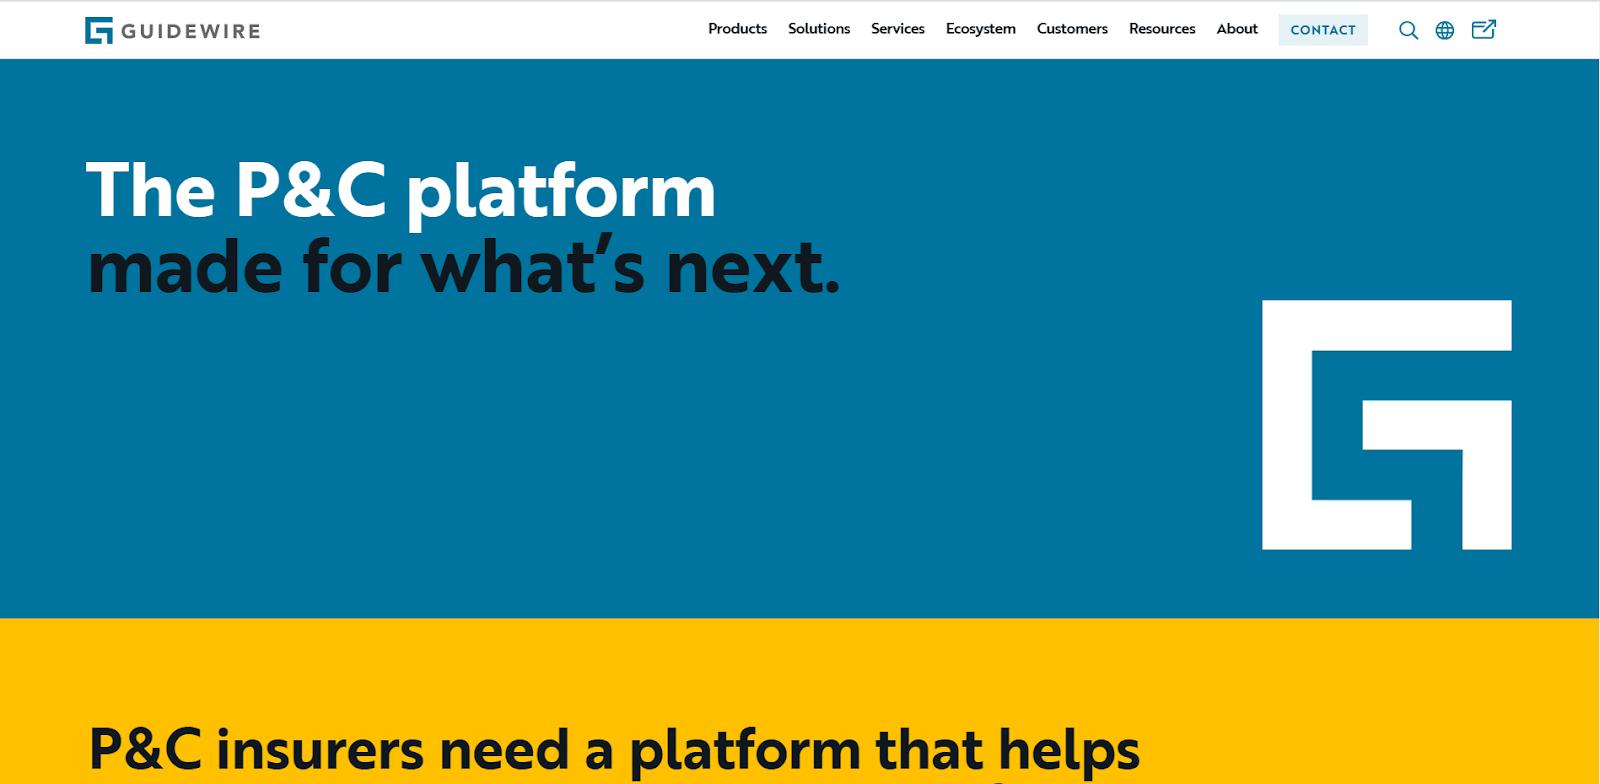 Guidewireのウェブサイト